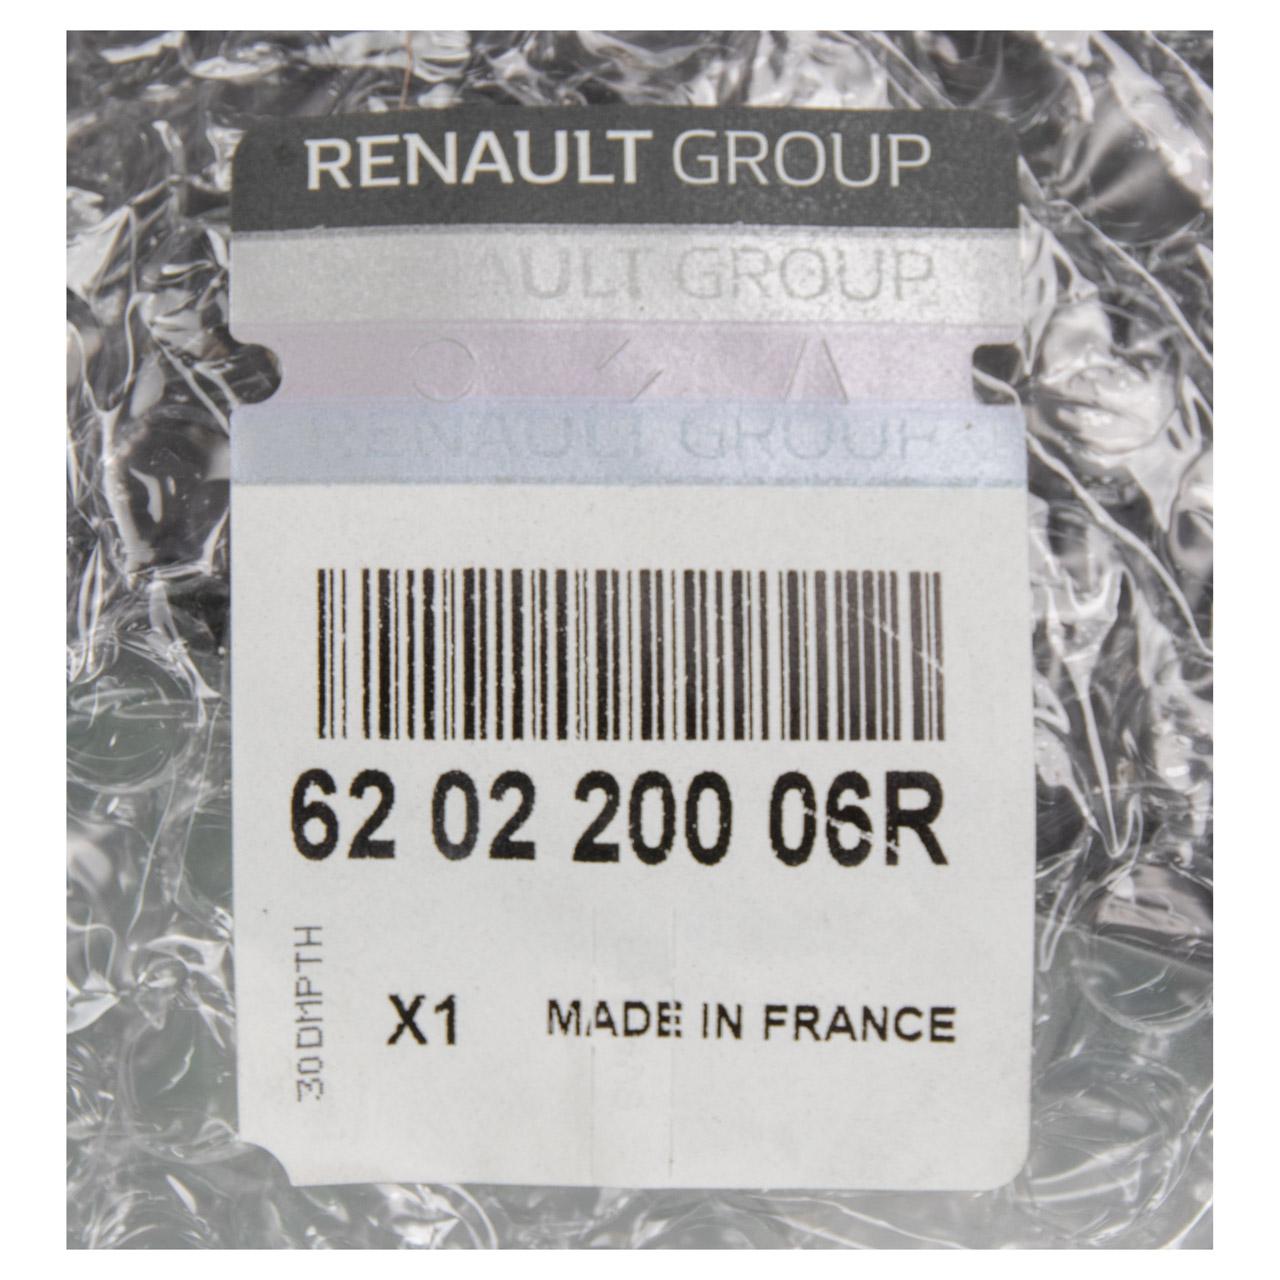 ORIGINAL Renault Stoßstange Stoßfänger Frontverkleidung MASTER III 620220006R